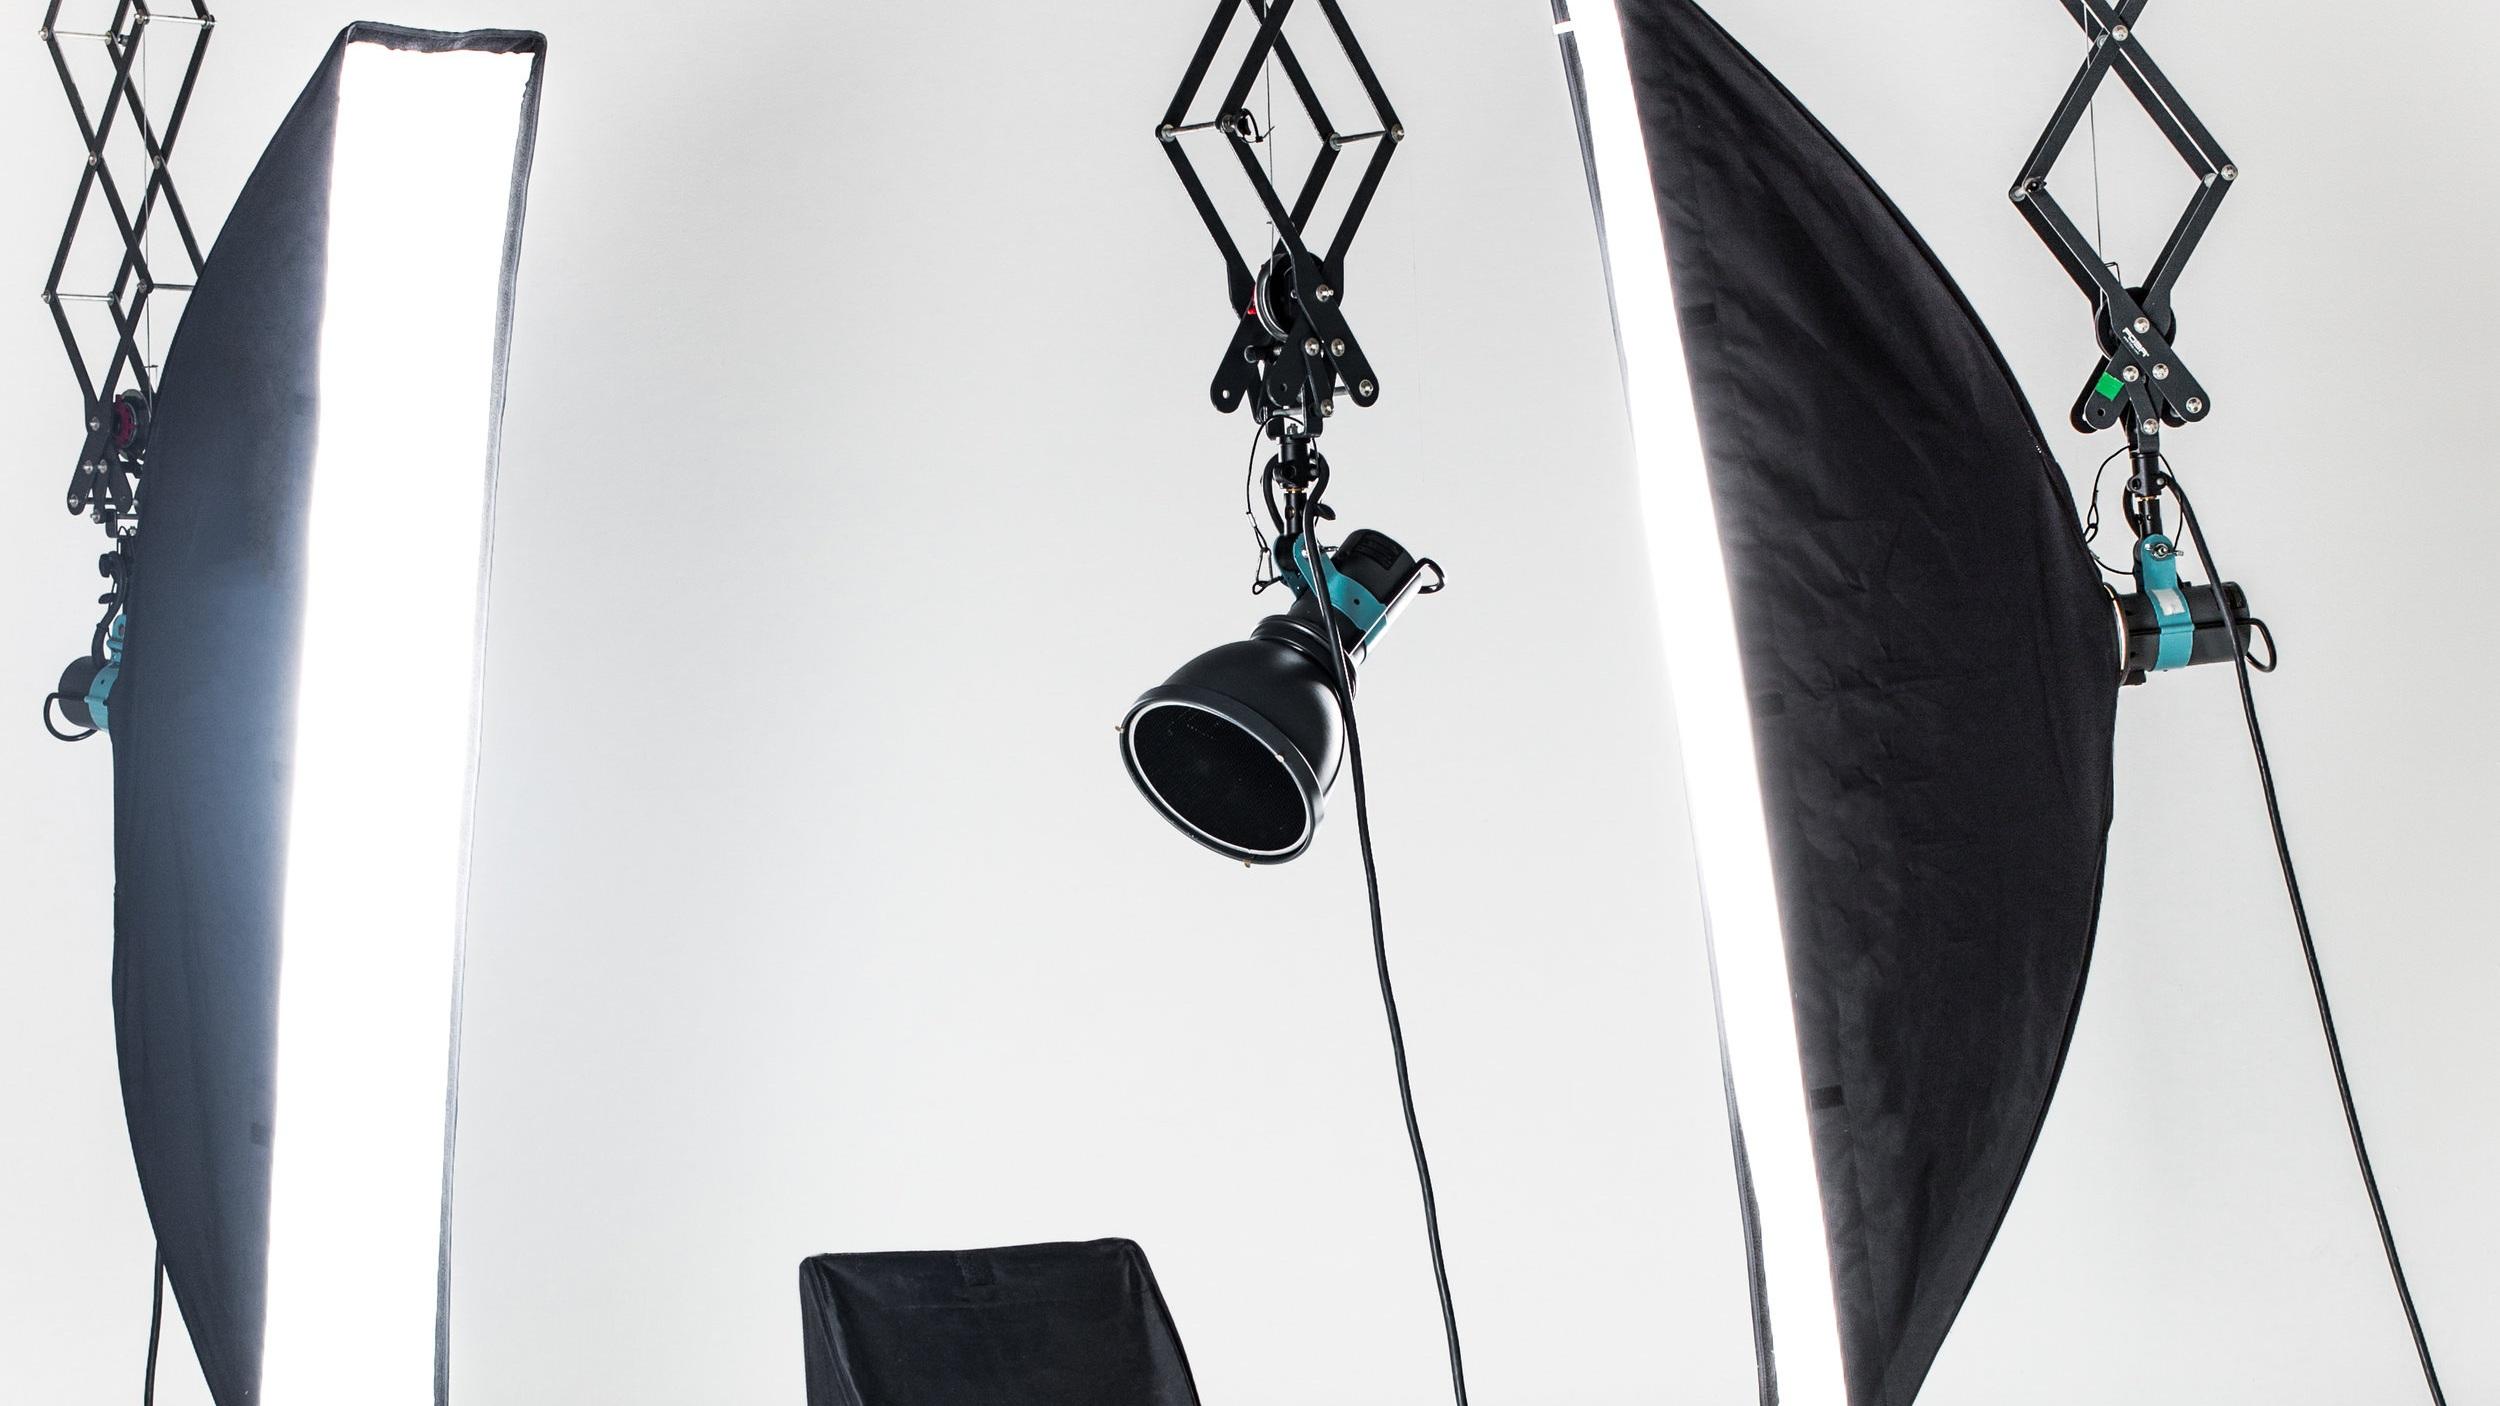 empty-photo-studio-with-lighting-equipment-P26SQZW.jpg